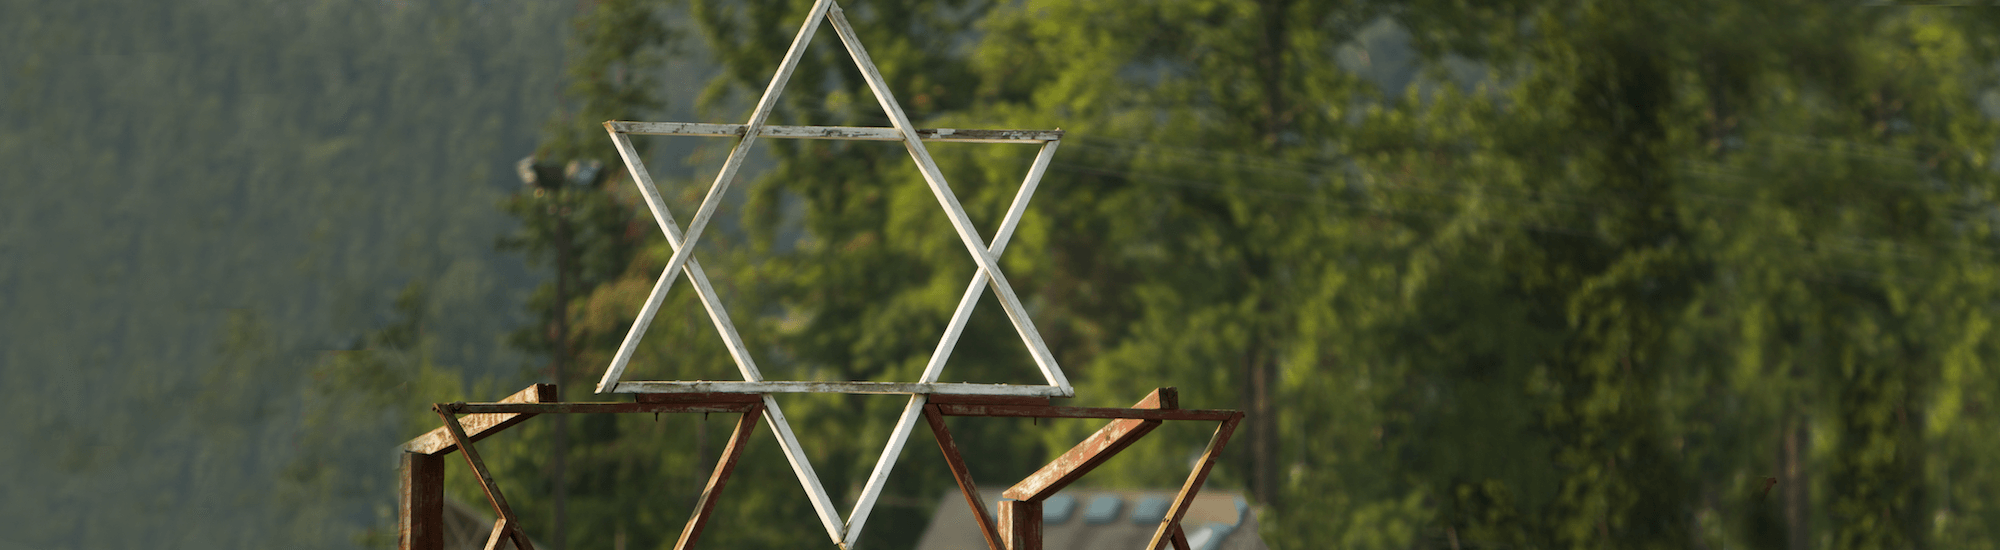 At EKC, we live Jewish<br/>valuesandtraditions